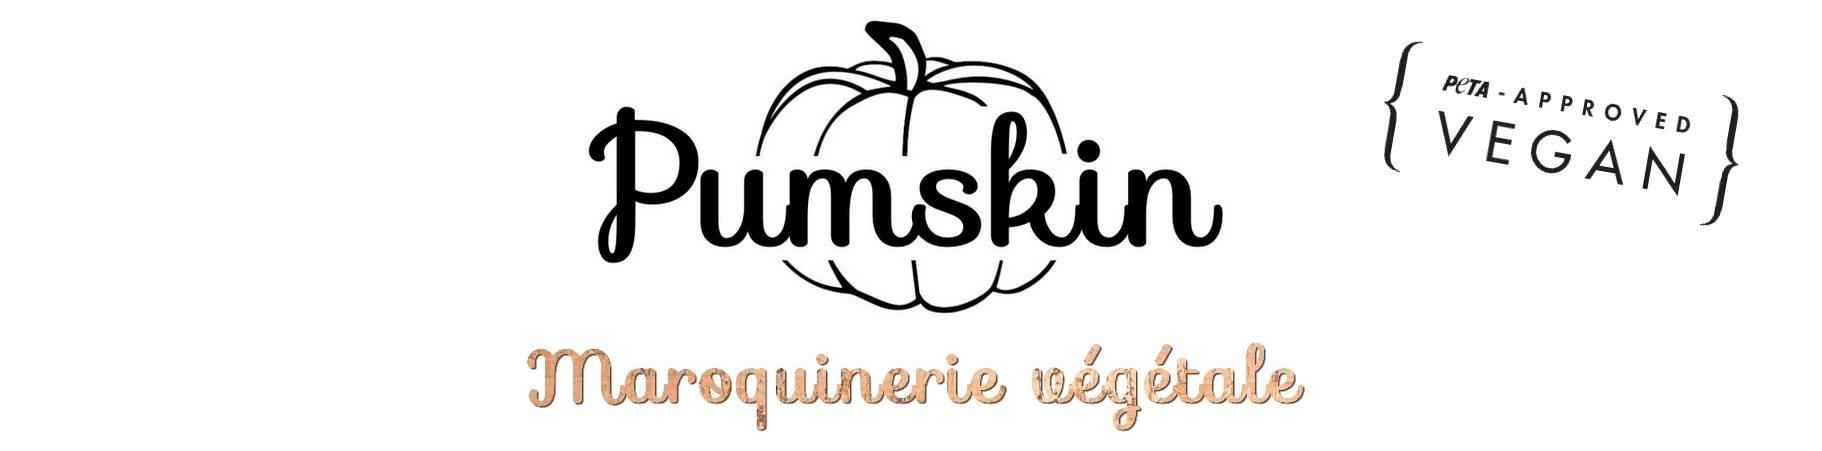 Pumskin